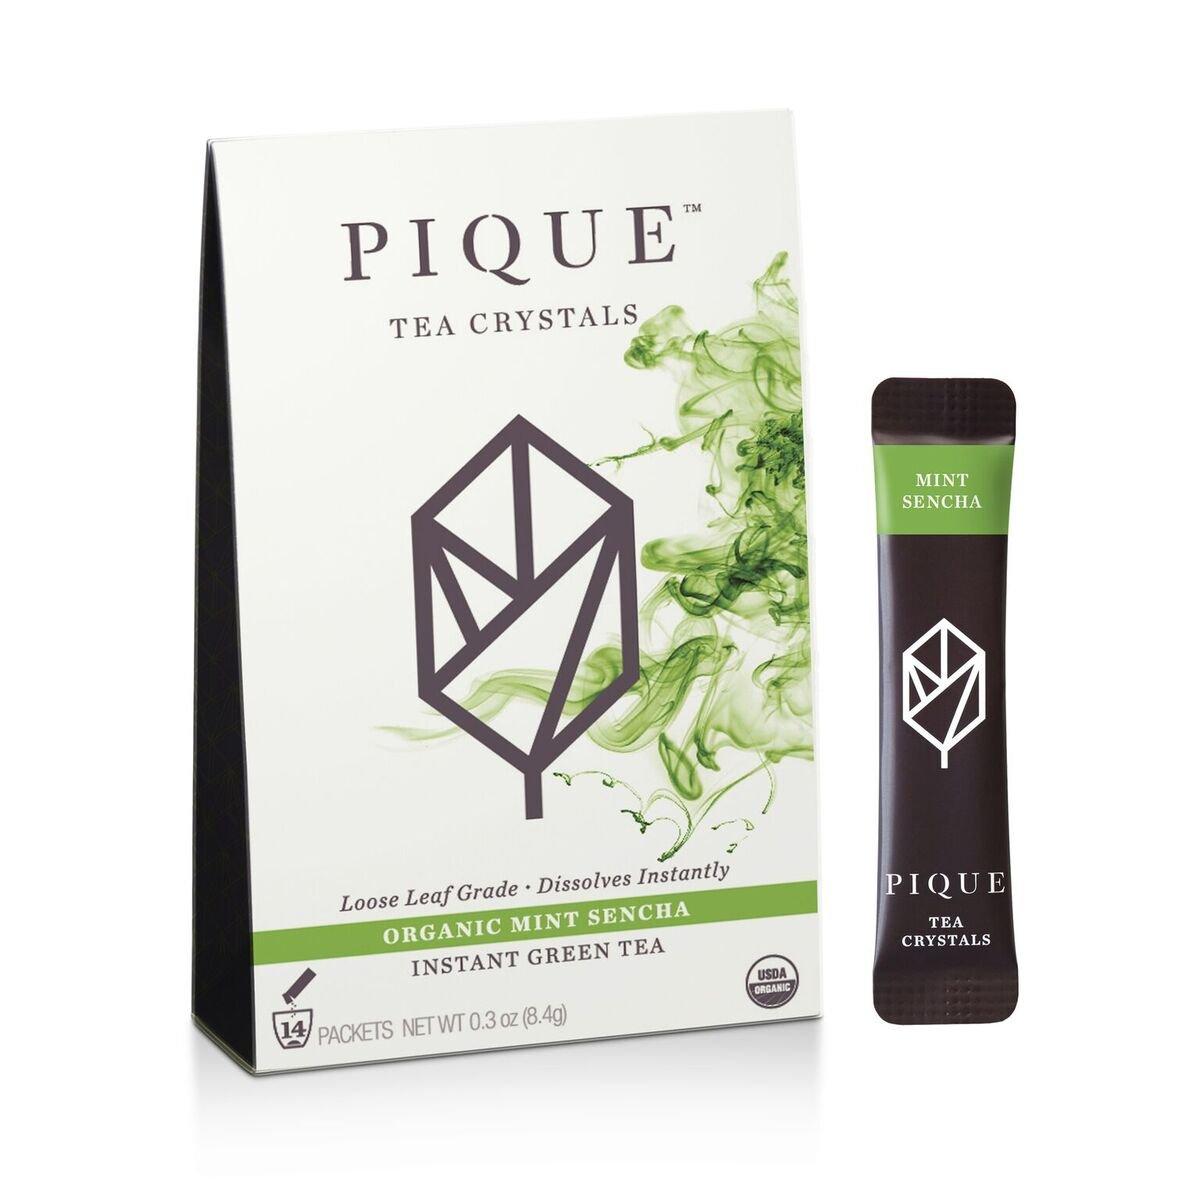 Pique - Cold Brew Instant Tea - Organic Mint Sencha Green Tea Powder - Antioxidants, Calm Energy, Sugar-Free - 14 Stick Packs